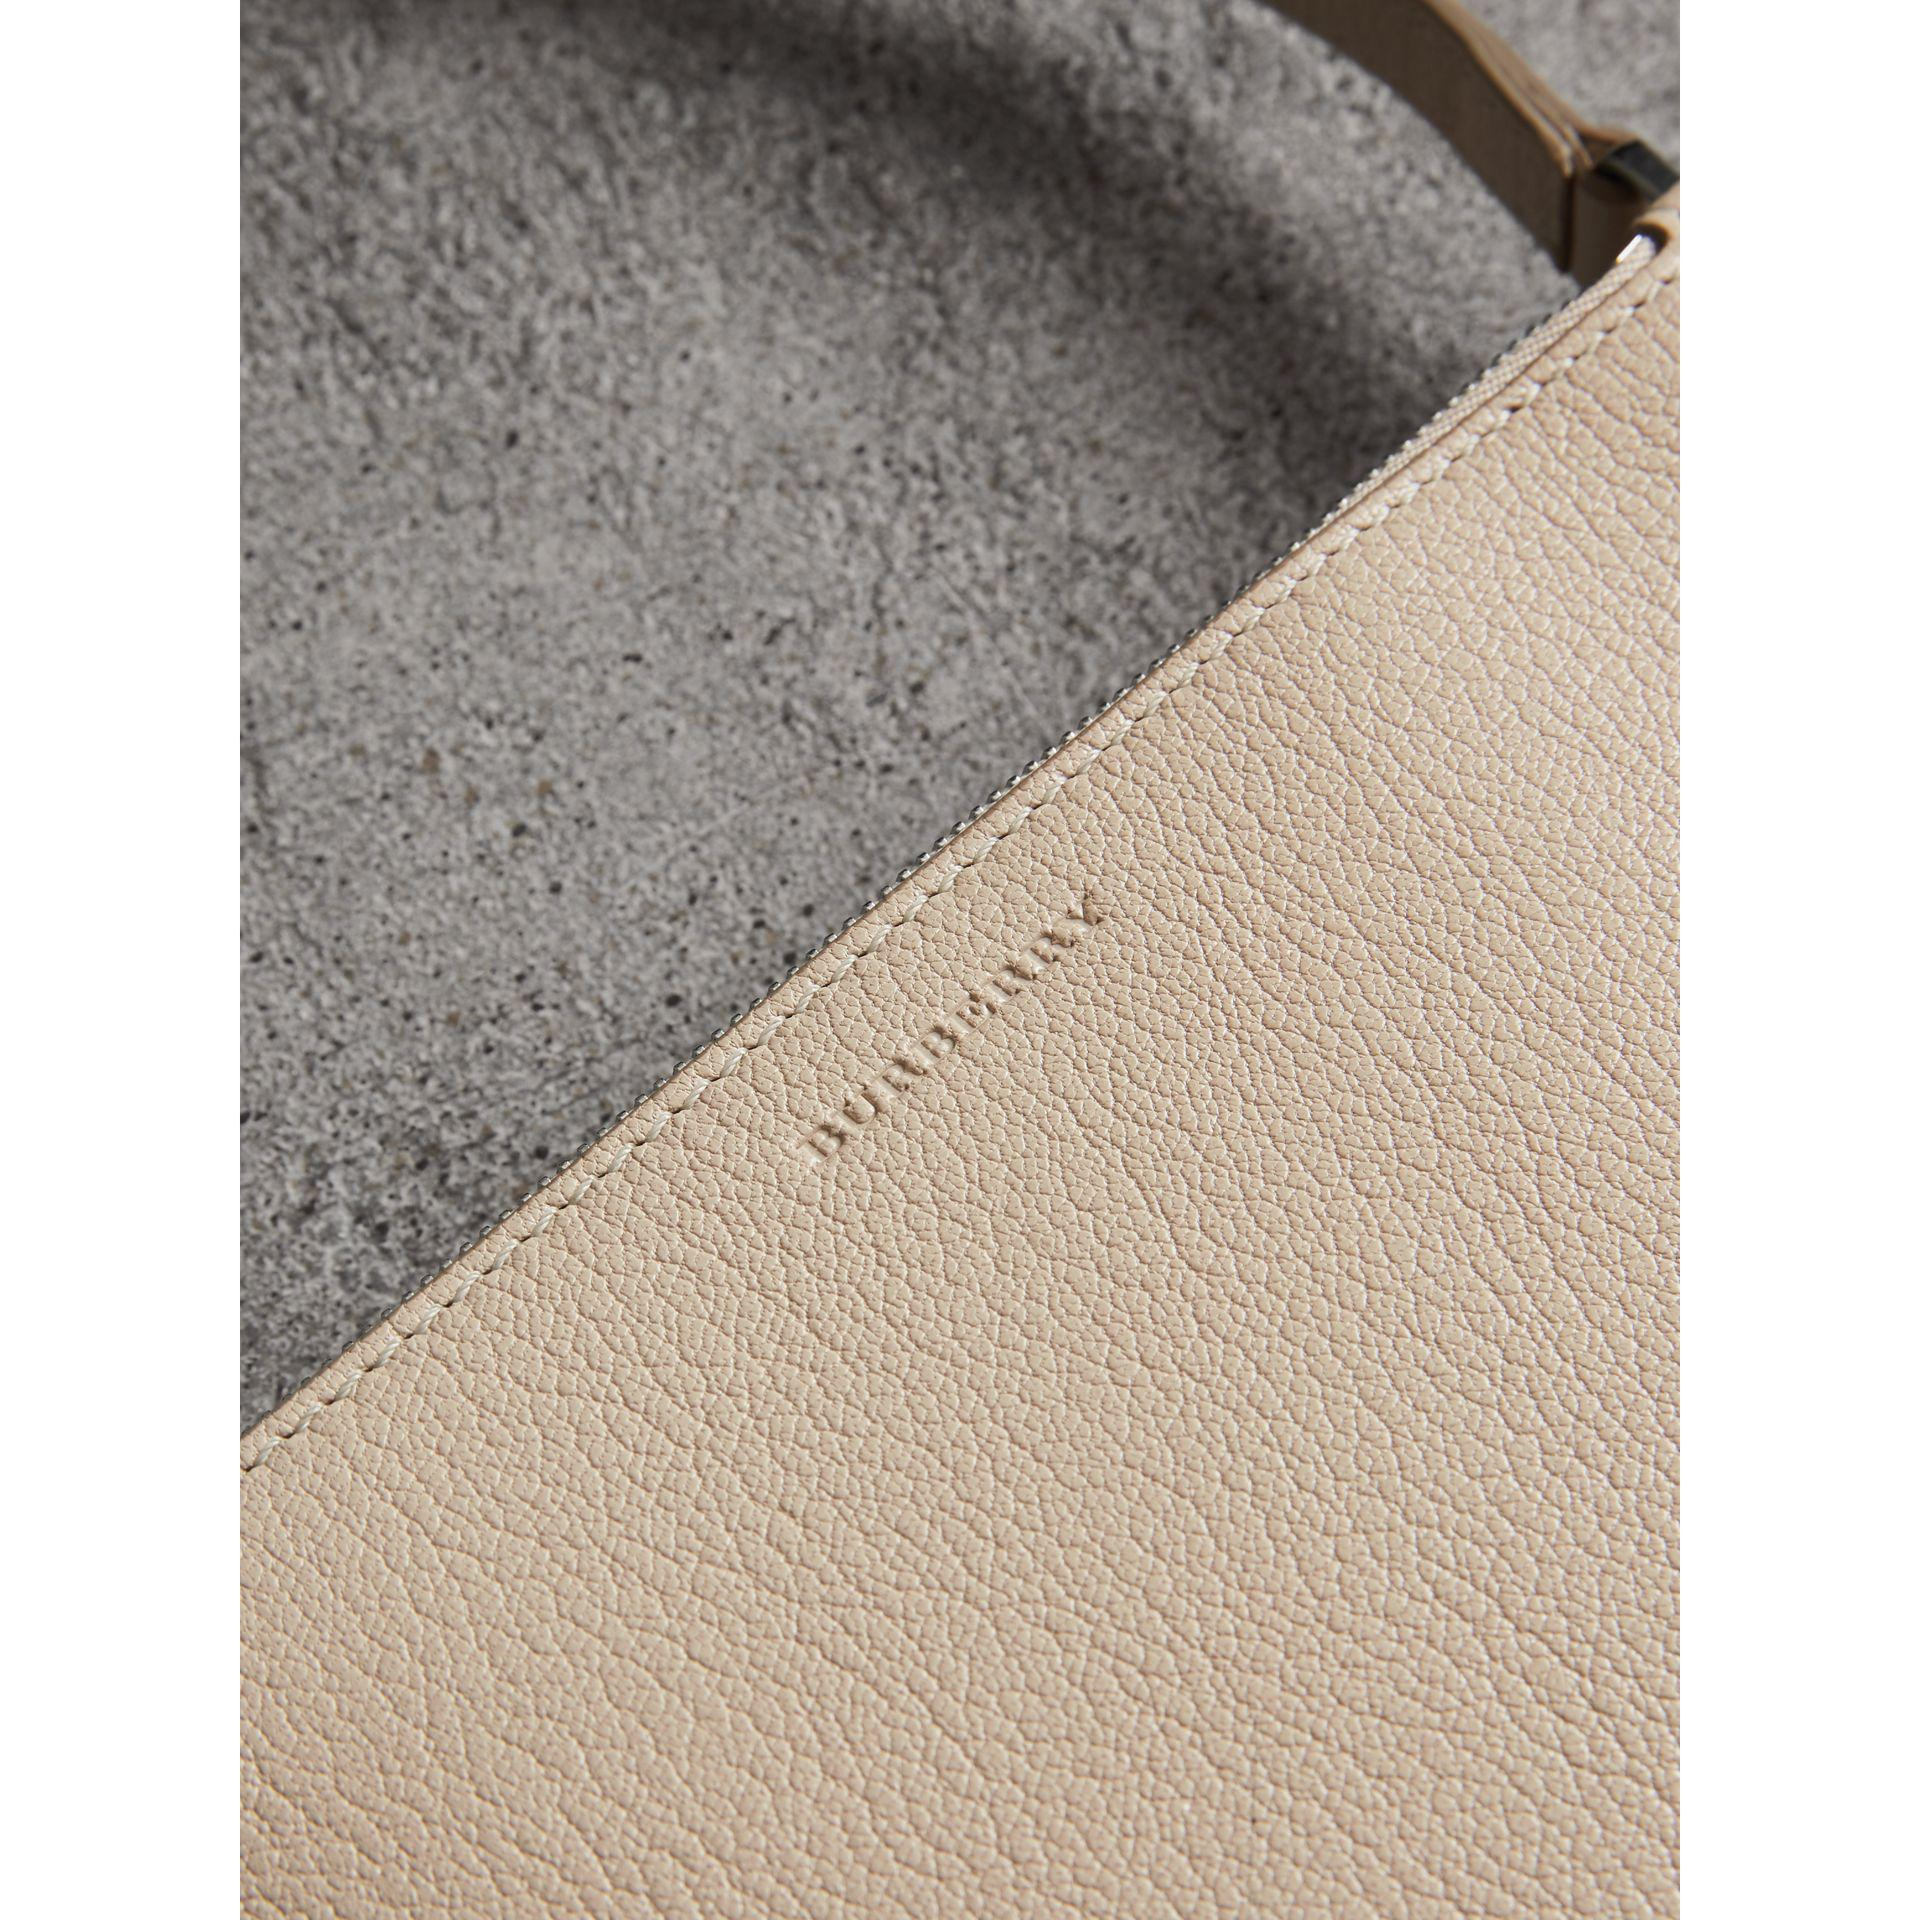 bb71d4fba05d Lyst - Burberry Triple Zip Grainy Leather Crossbody Bag